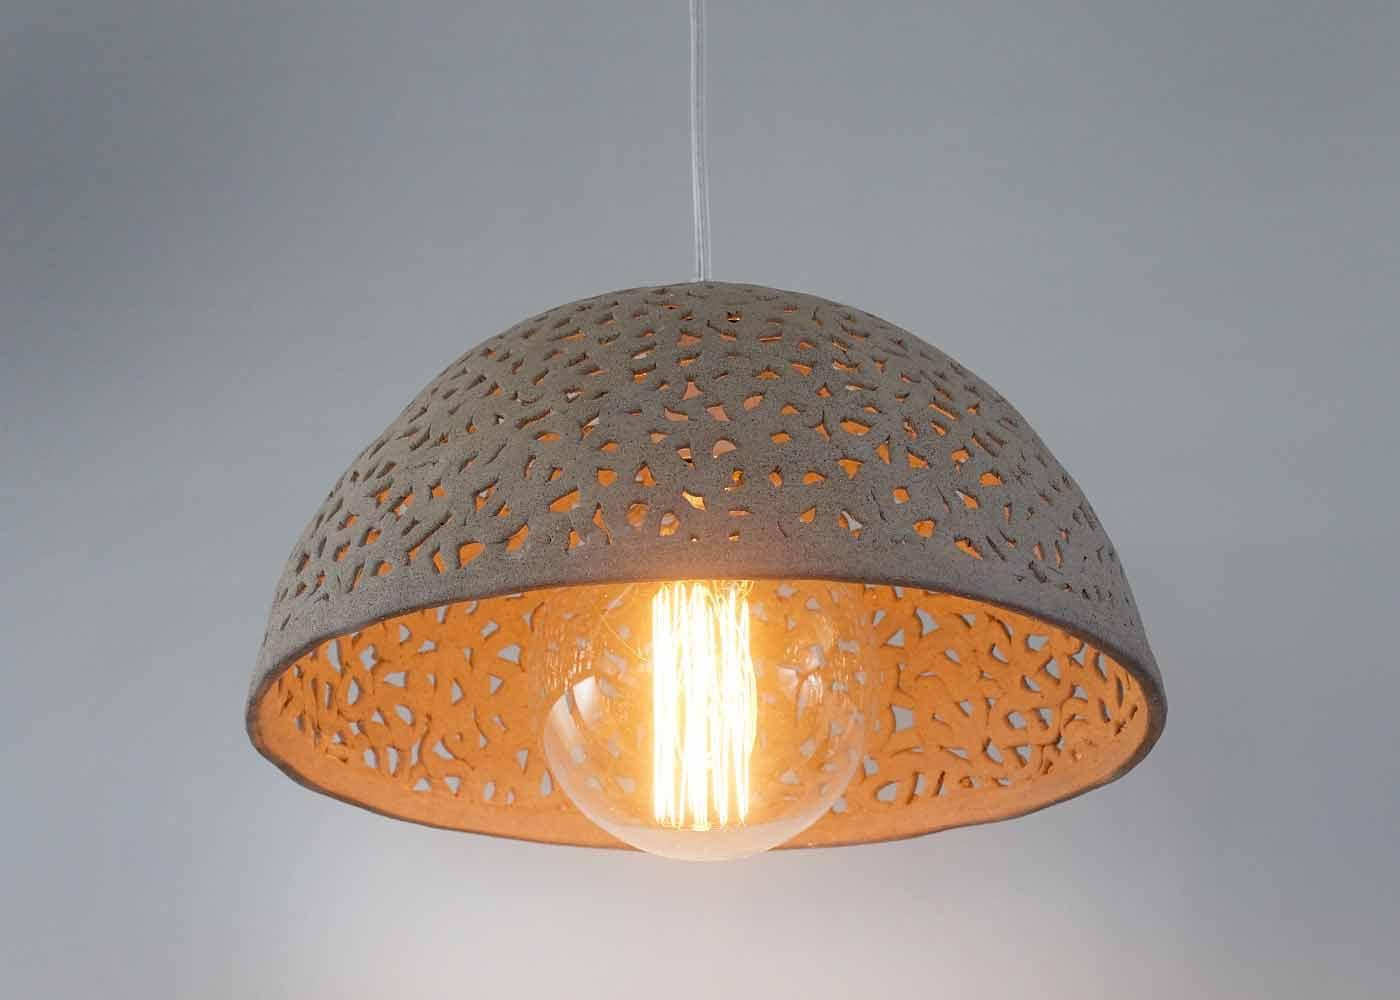 Ceramic lamp shade dome pendant light pendant lighting zoom arubaitofo Choice Image